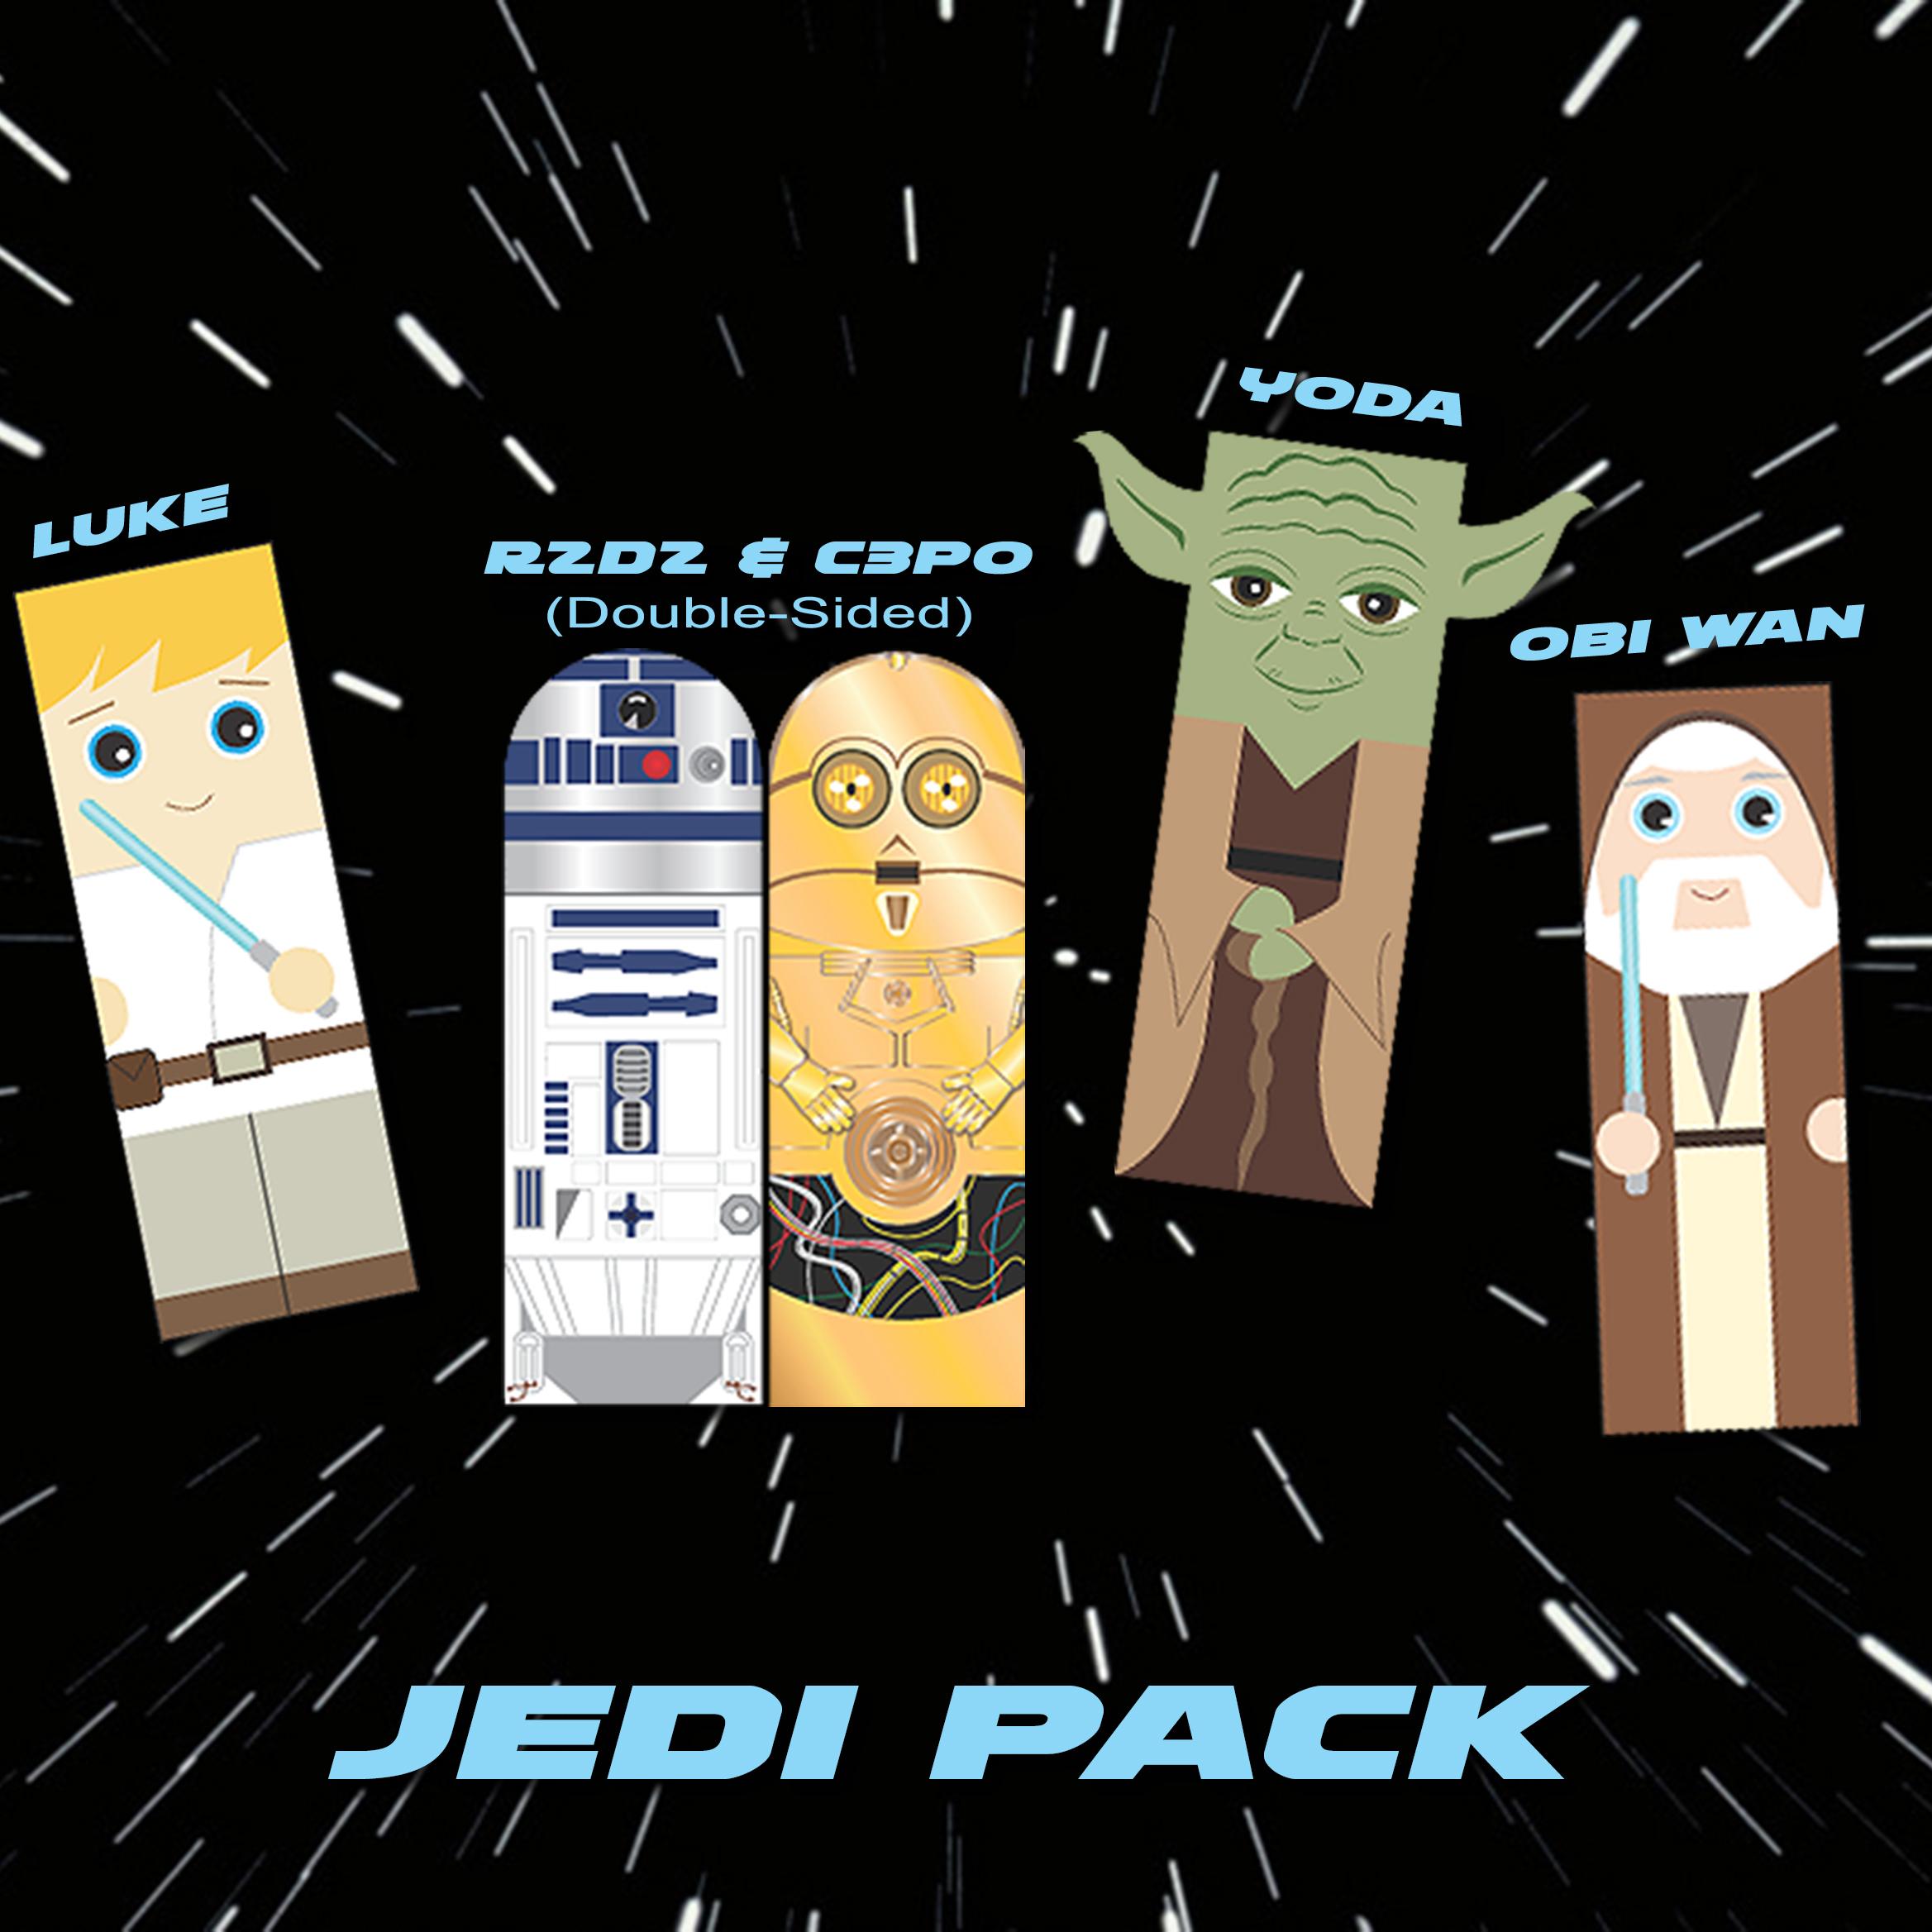 Star Wars Bookmarks_Jedi Pack